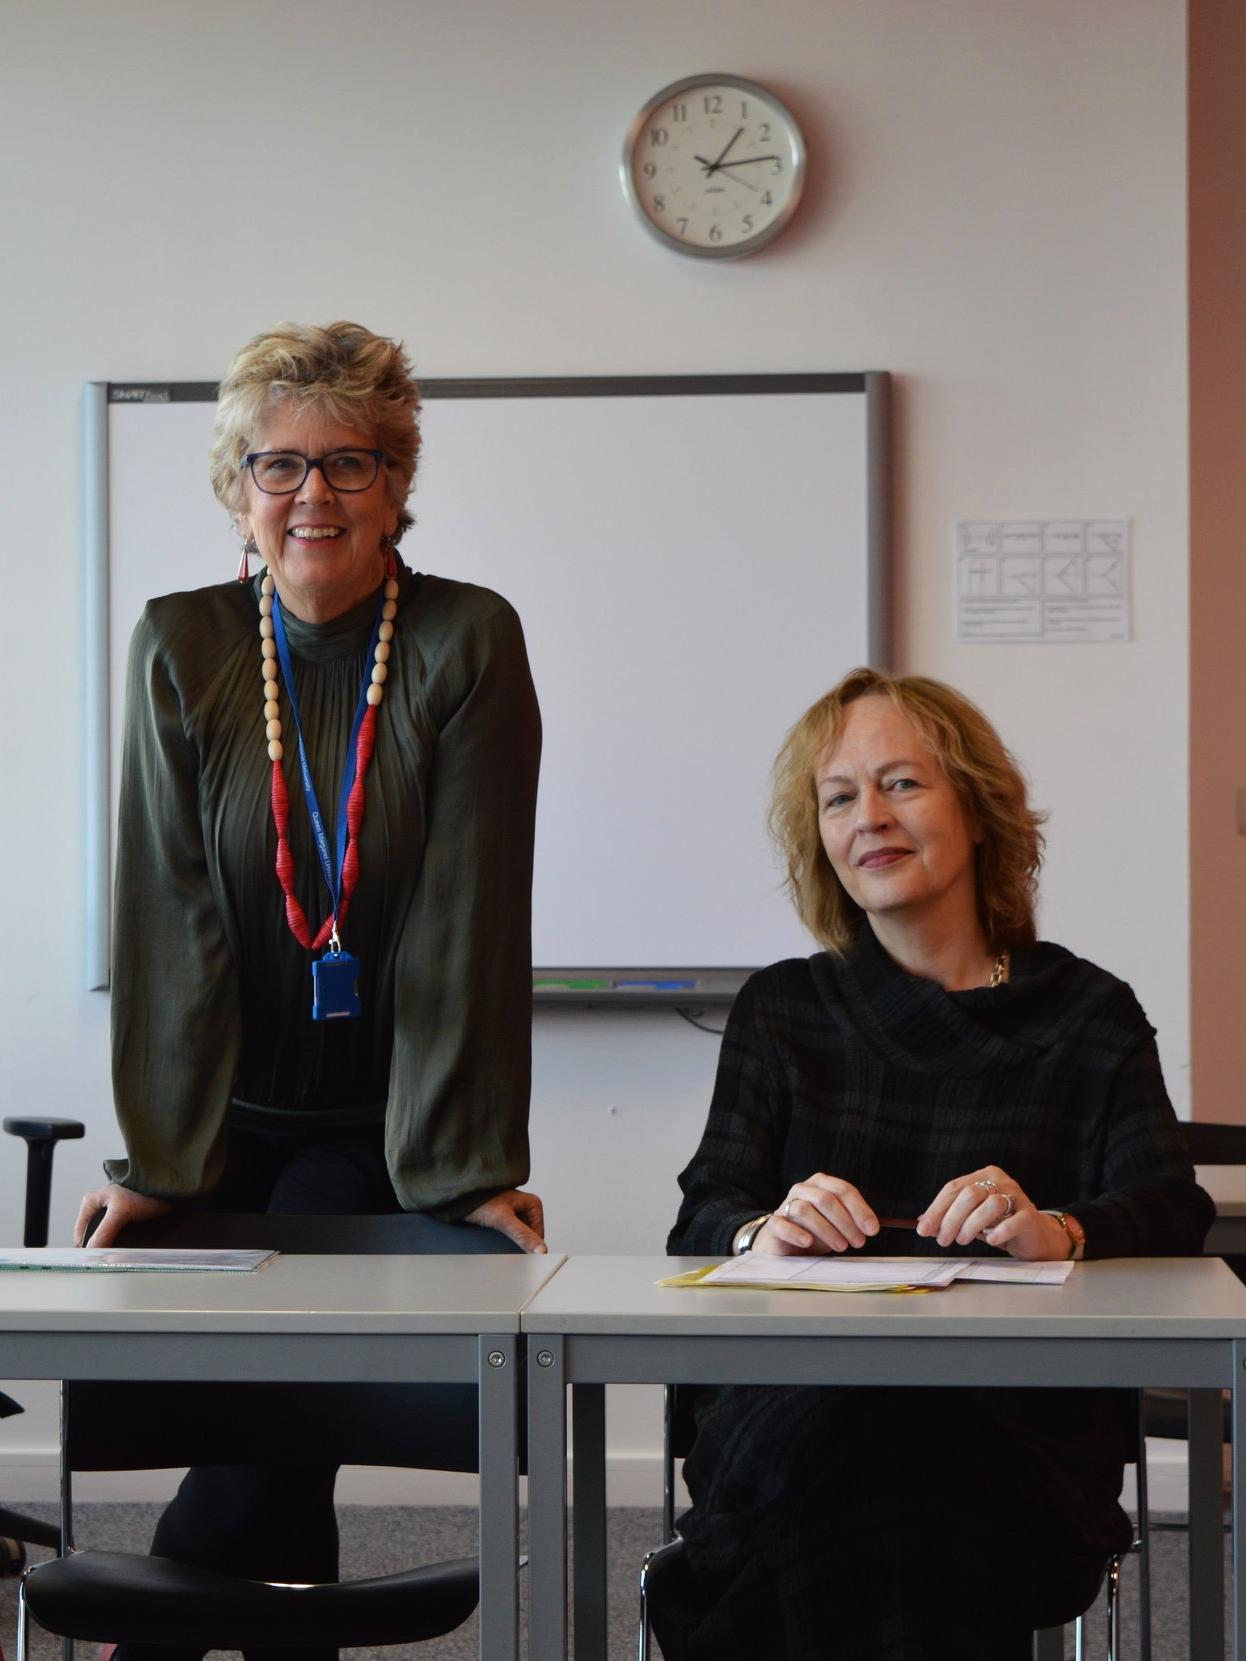 Prue Leith with Queen Margaret University's Principal,  Professor Petra Wend